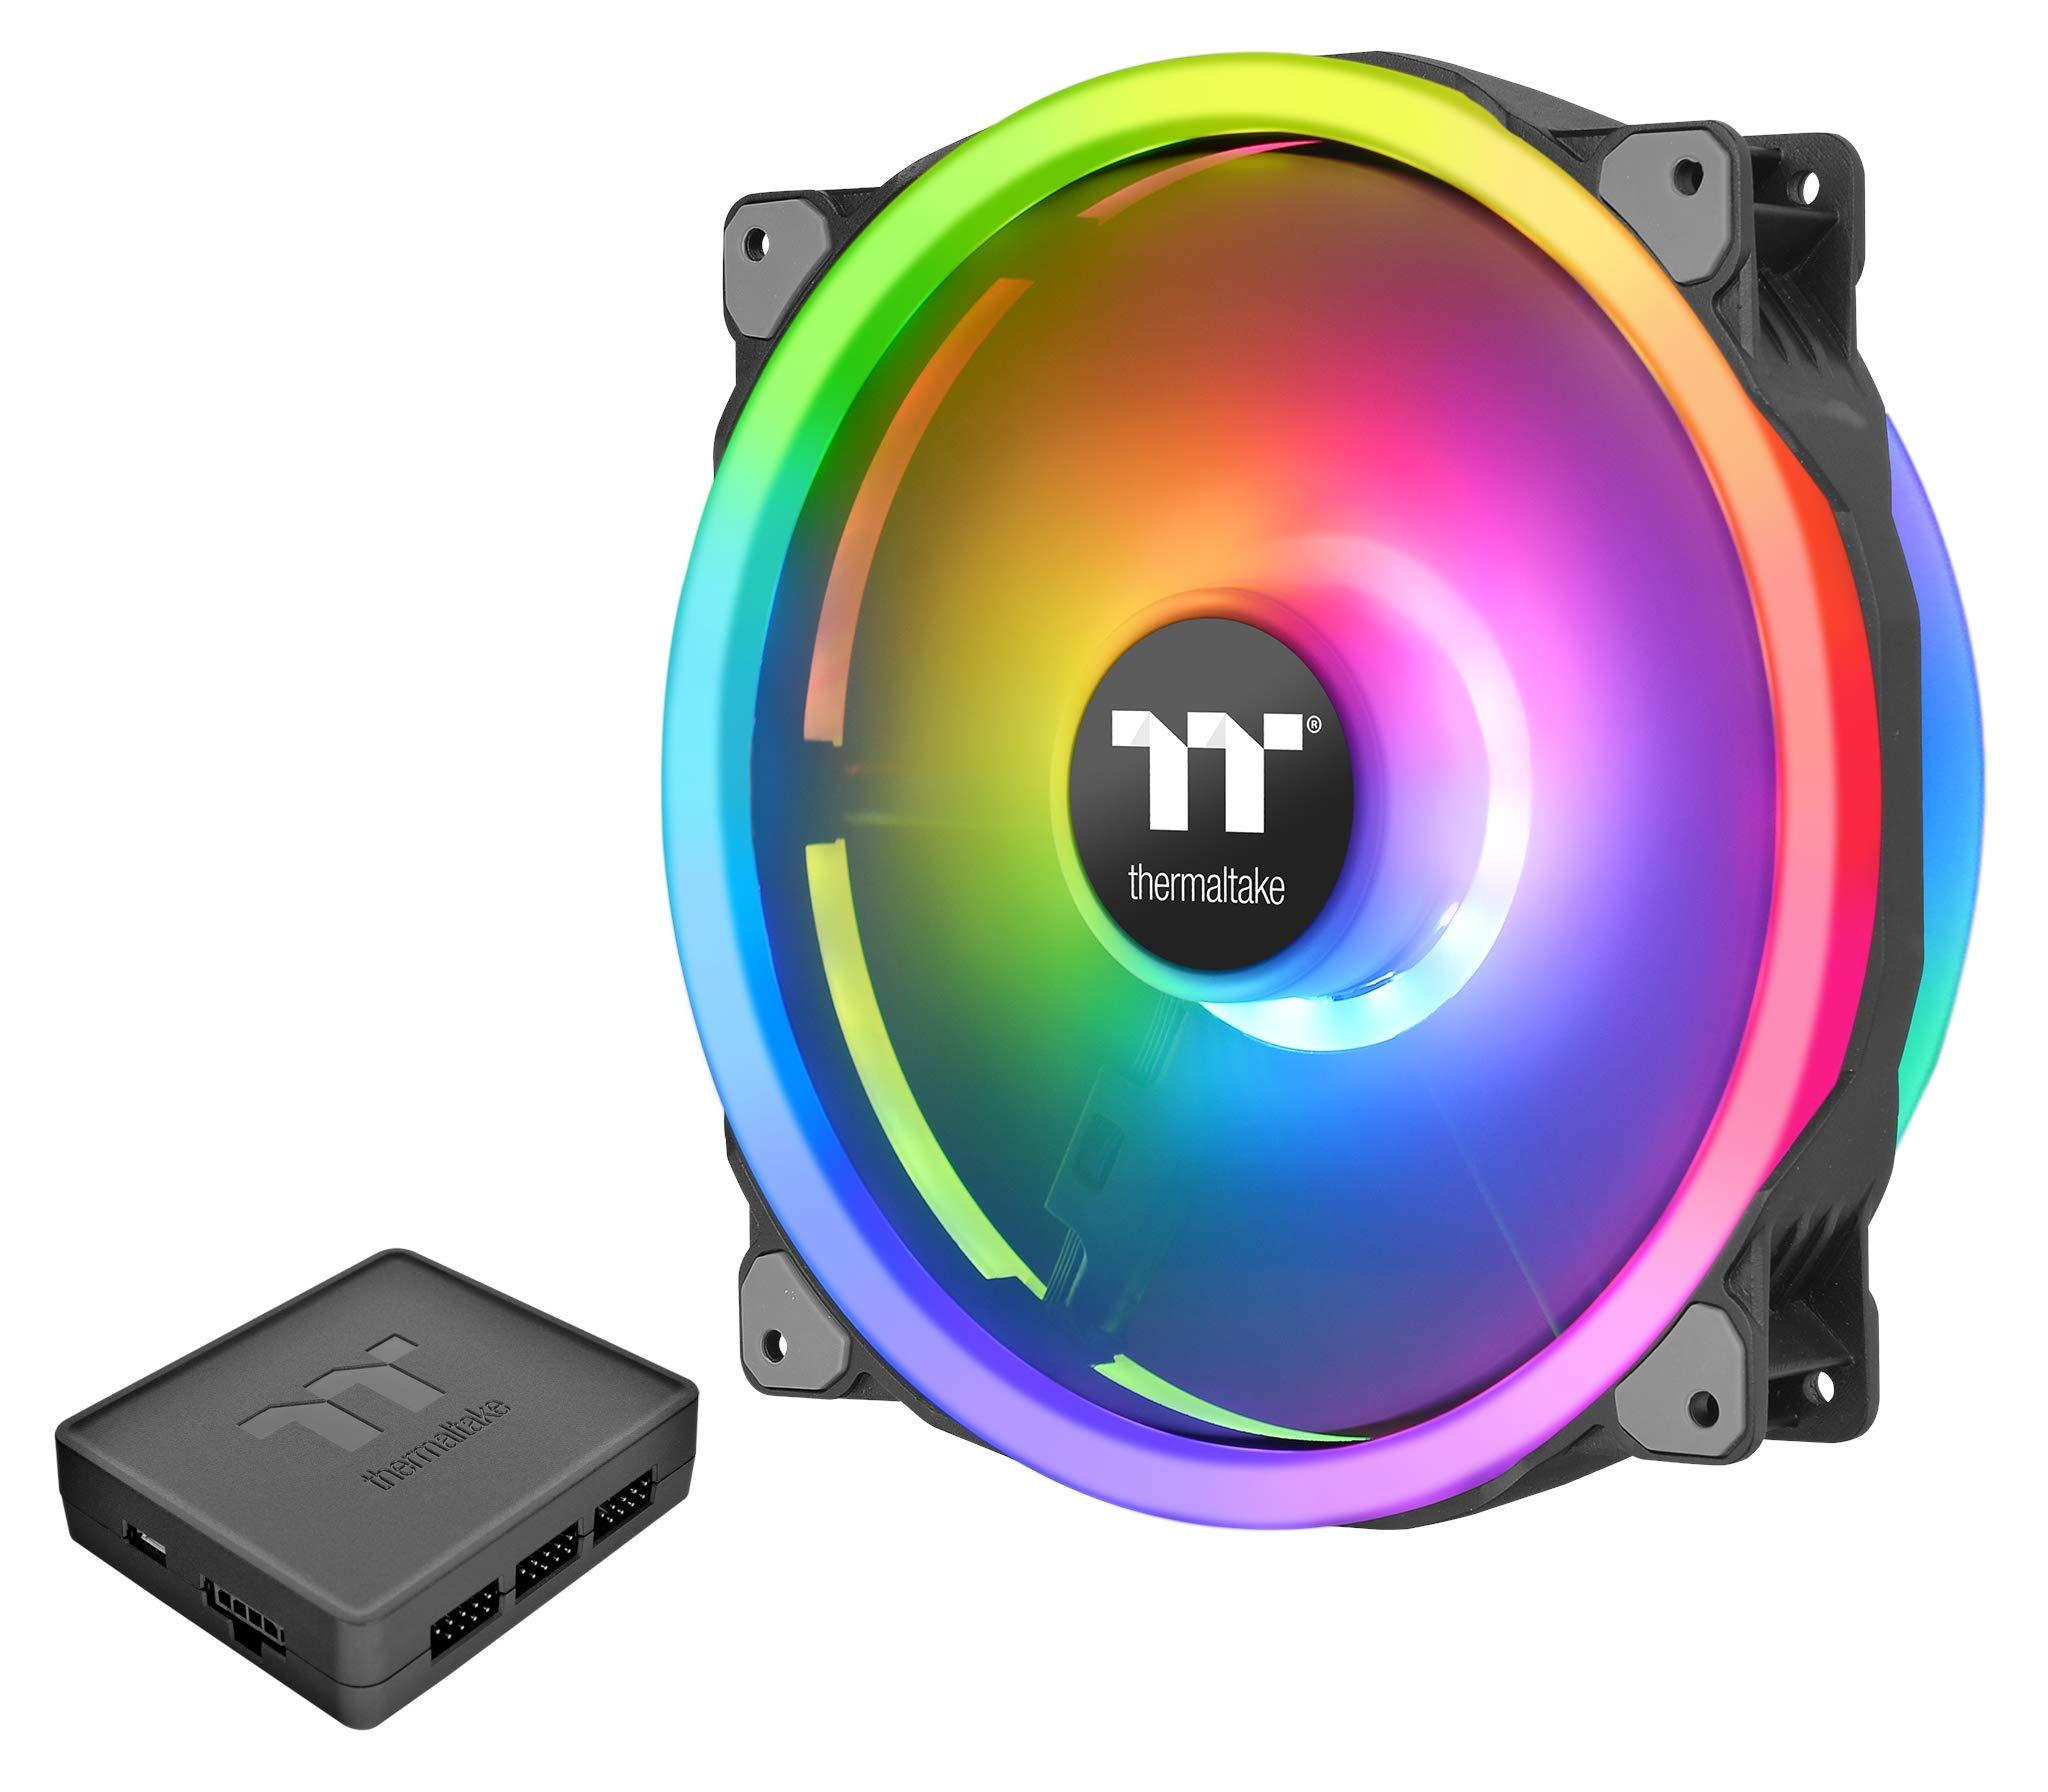 Thermaltake Riing Trio 200mm 16.8 Million RGB Color (Alexa, Razer Chroma) Software Enabled 60 Addressable LED 11 Blades Hydraulic Bearing Case/Radiator Fan, Single Fan Pack, CL-F083-PL20SW-A